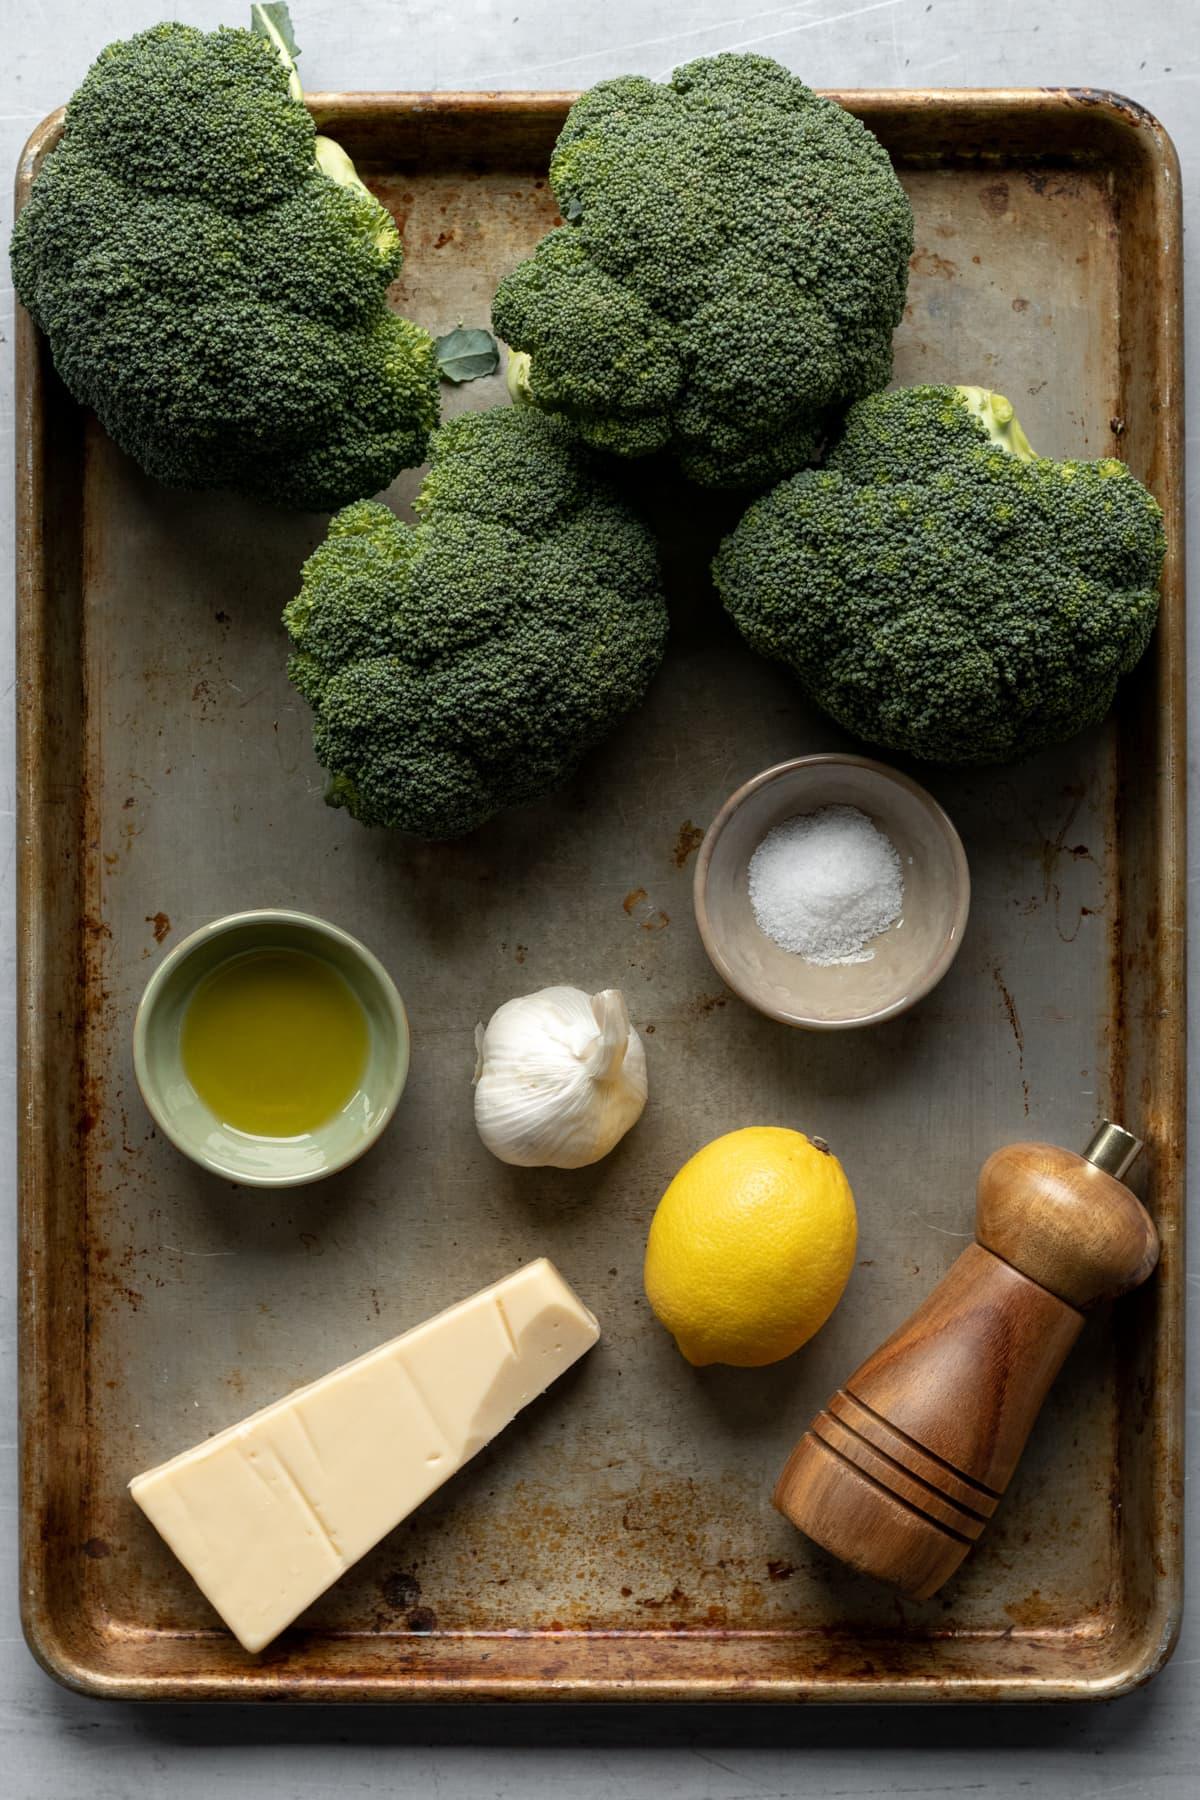 broccoli, garlic, lemon, oil, salt, pepper, and vegan cheese on a baking sheet